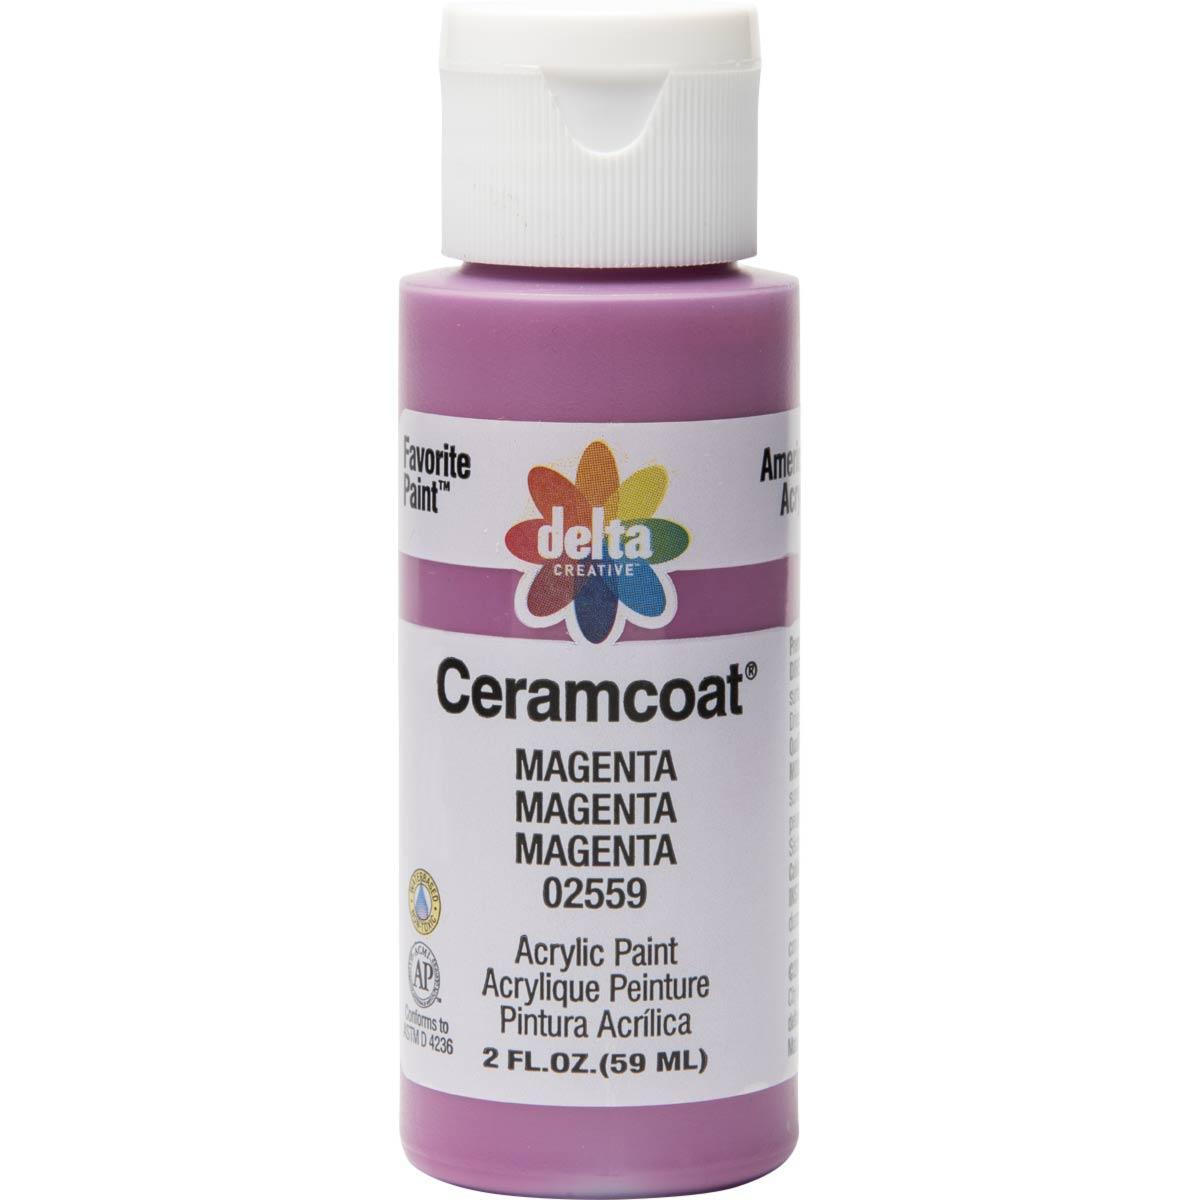 Delta Ceramcoat ® Acrylic Paint - Magenta, 2 oz.